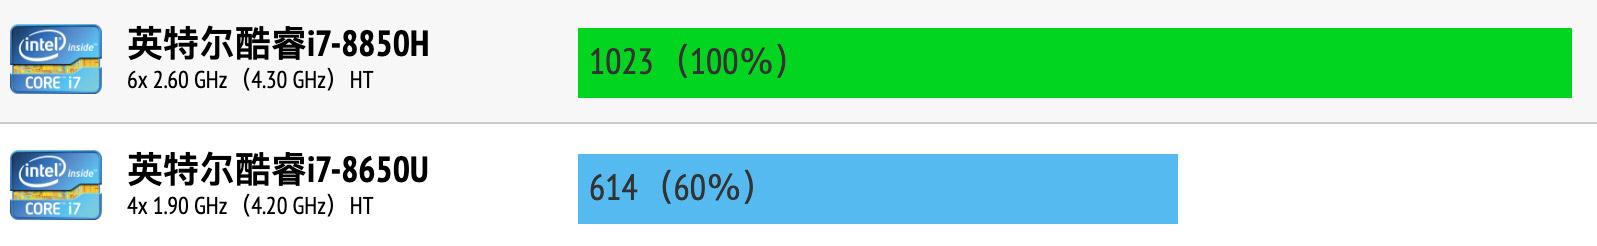 Intel Core i7-8850H和i7-8650U性能跑分对比评测